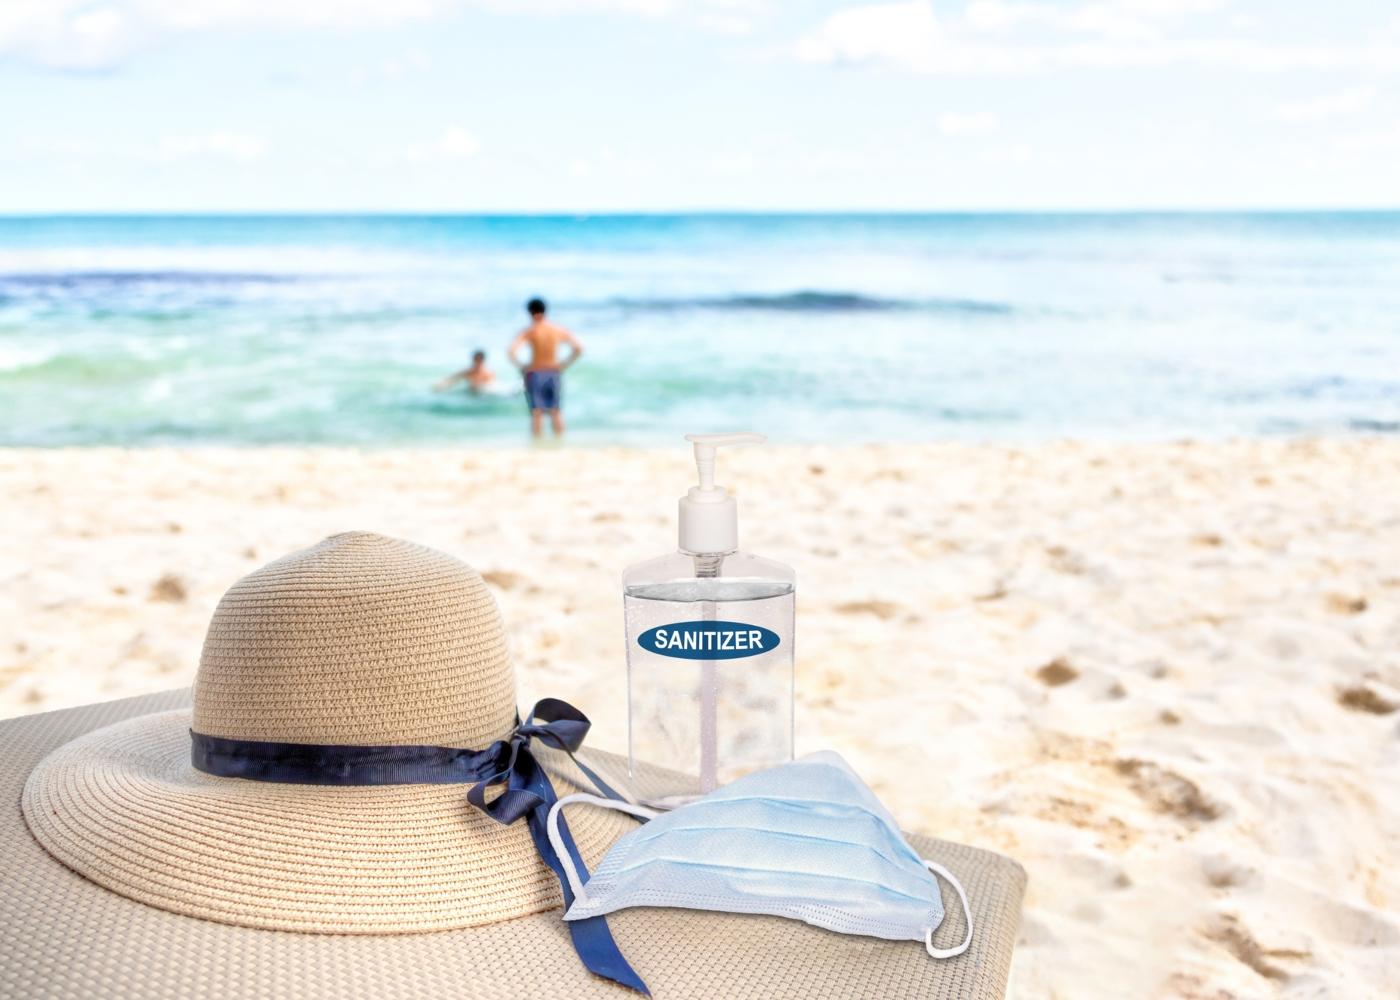 Máscara, chapéu e álcool-gel em cima de esteira na praia